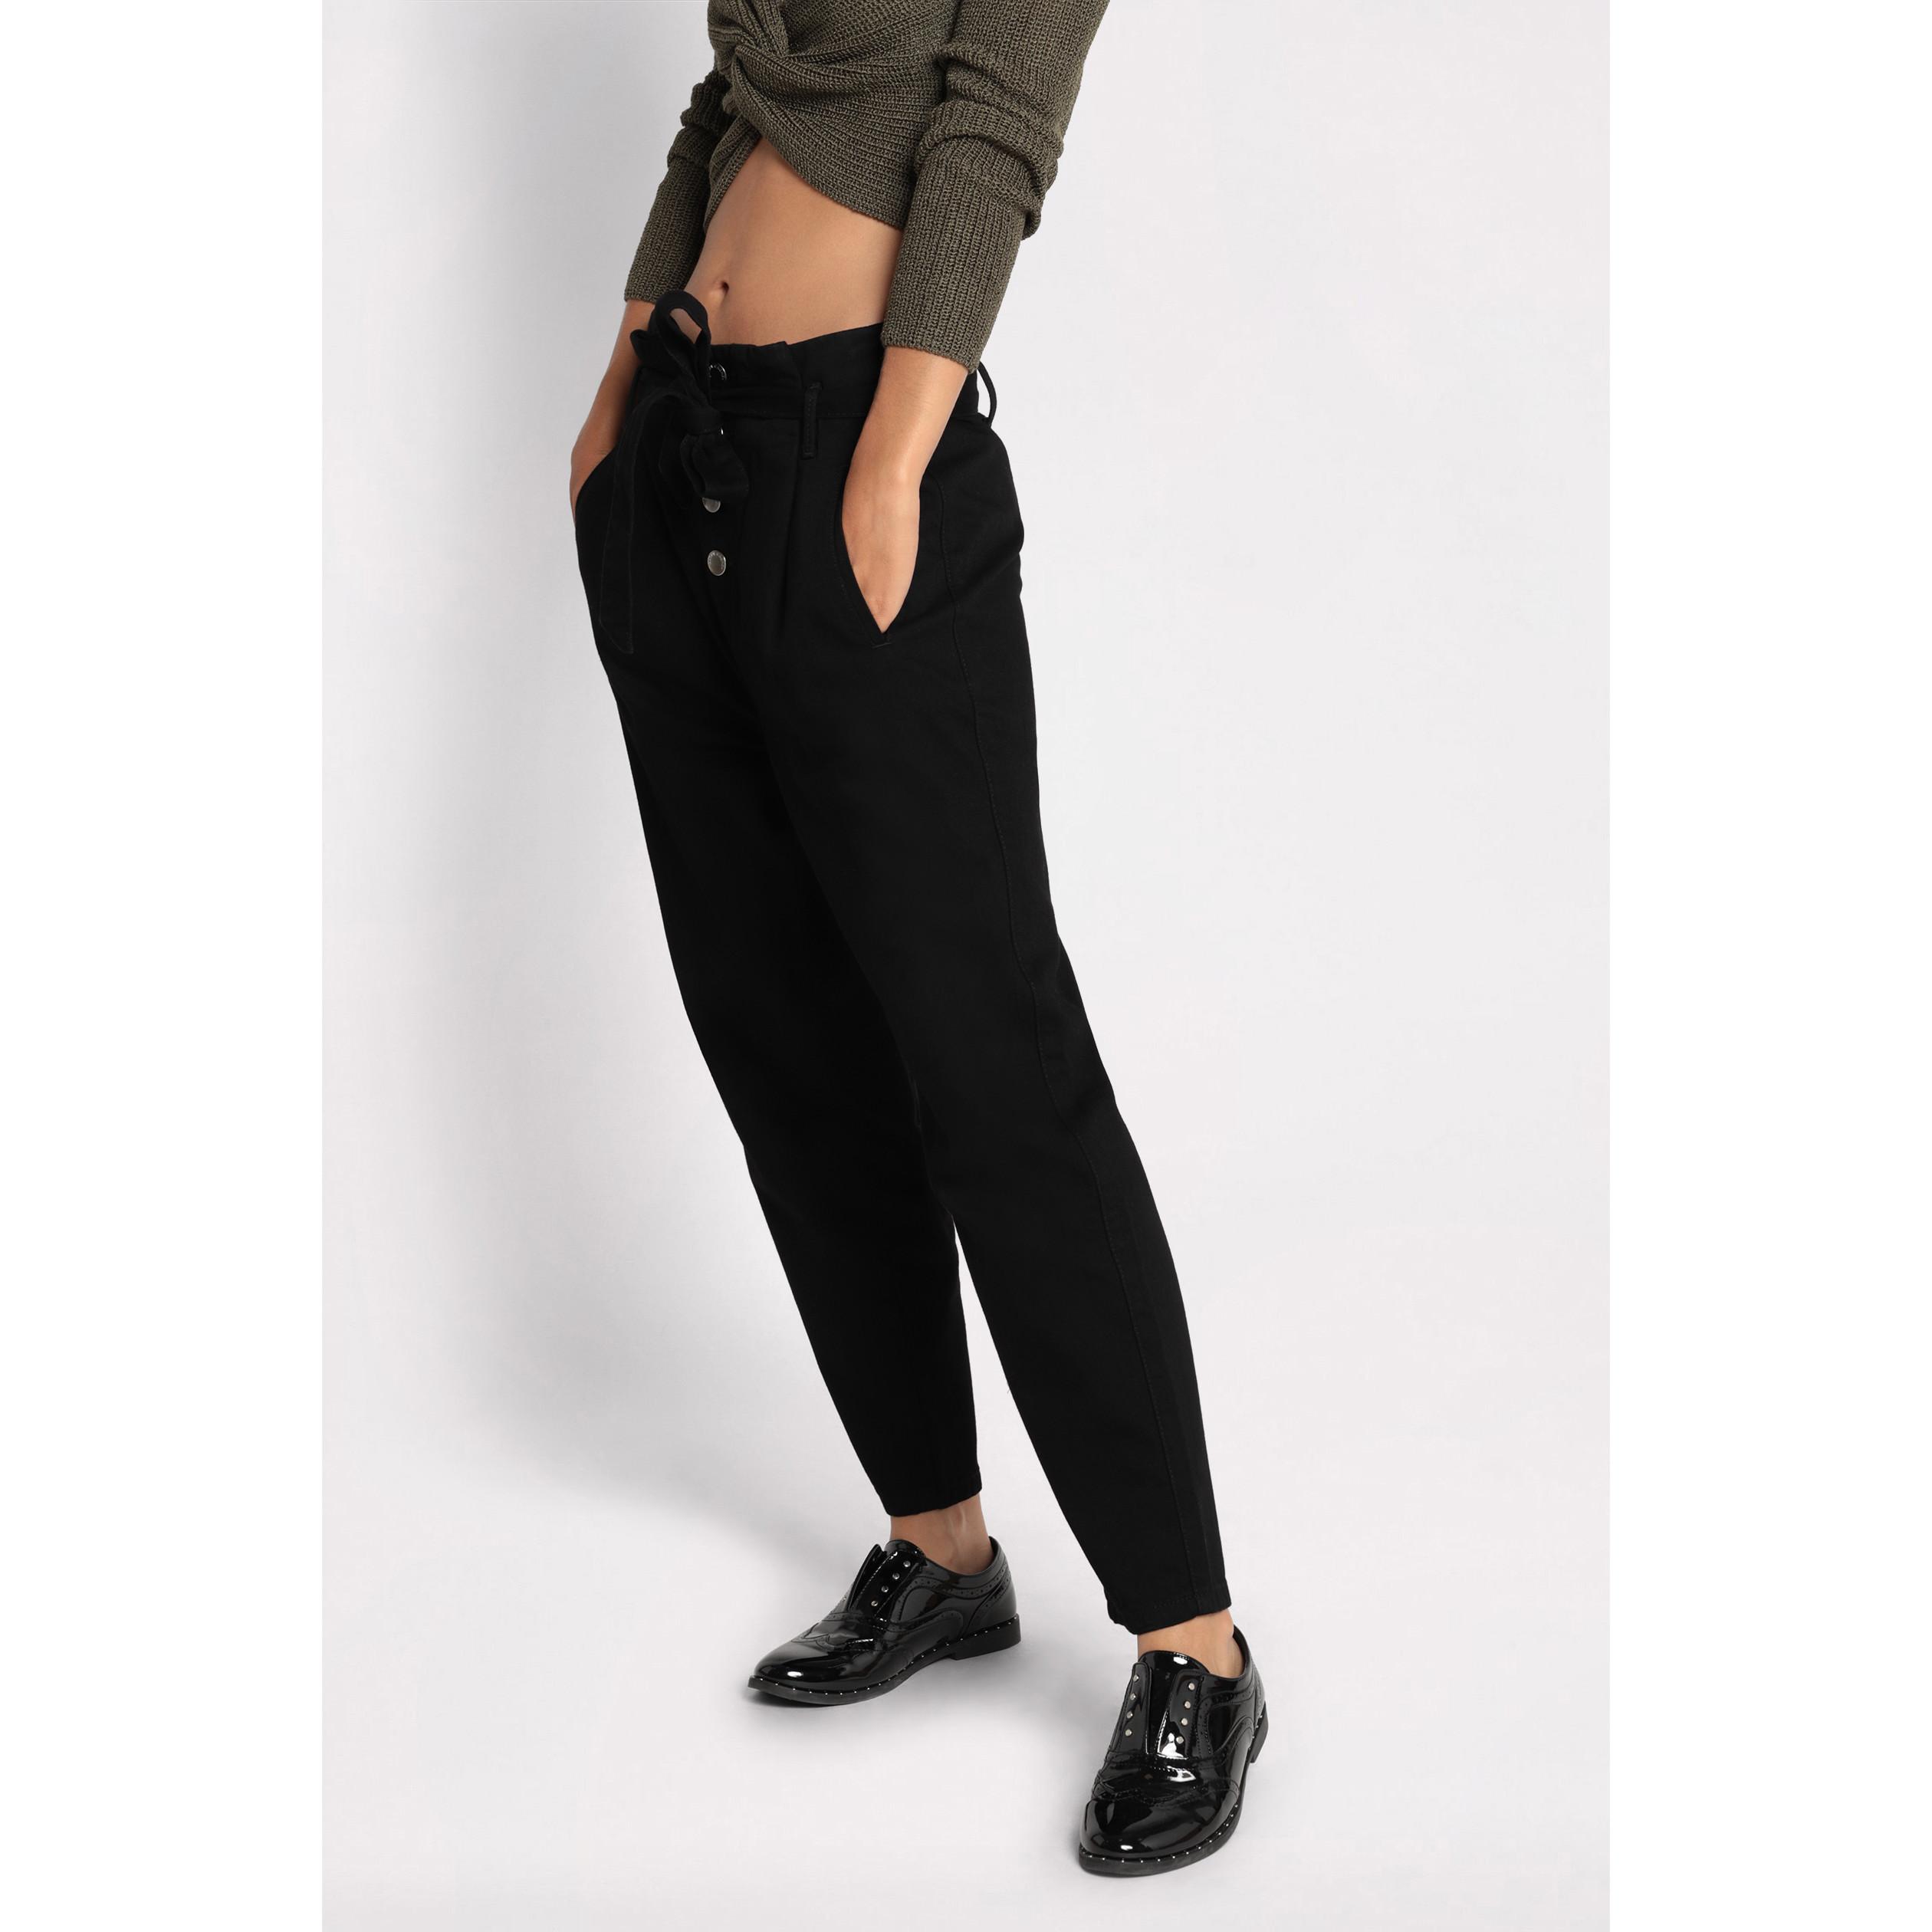 Femme Paperbag Noir Boutonné Pantalon Denim nO0wPk